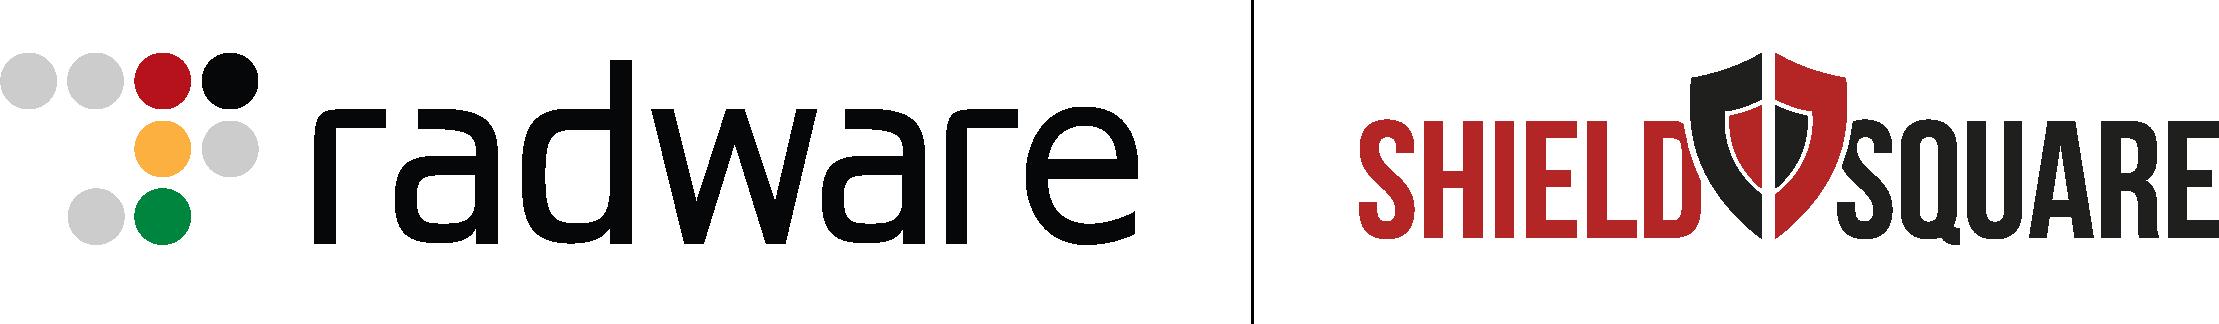 ShieldSquare